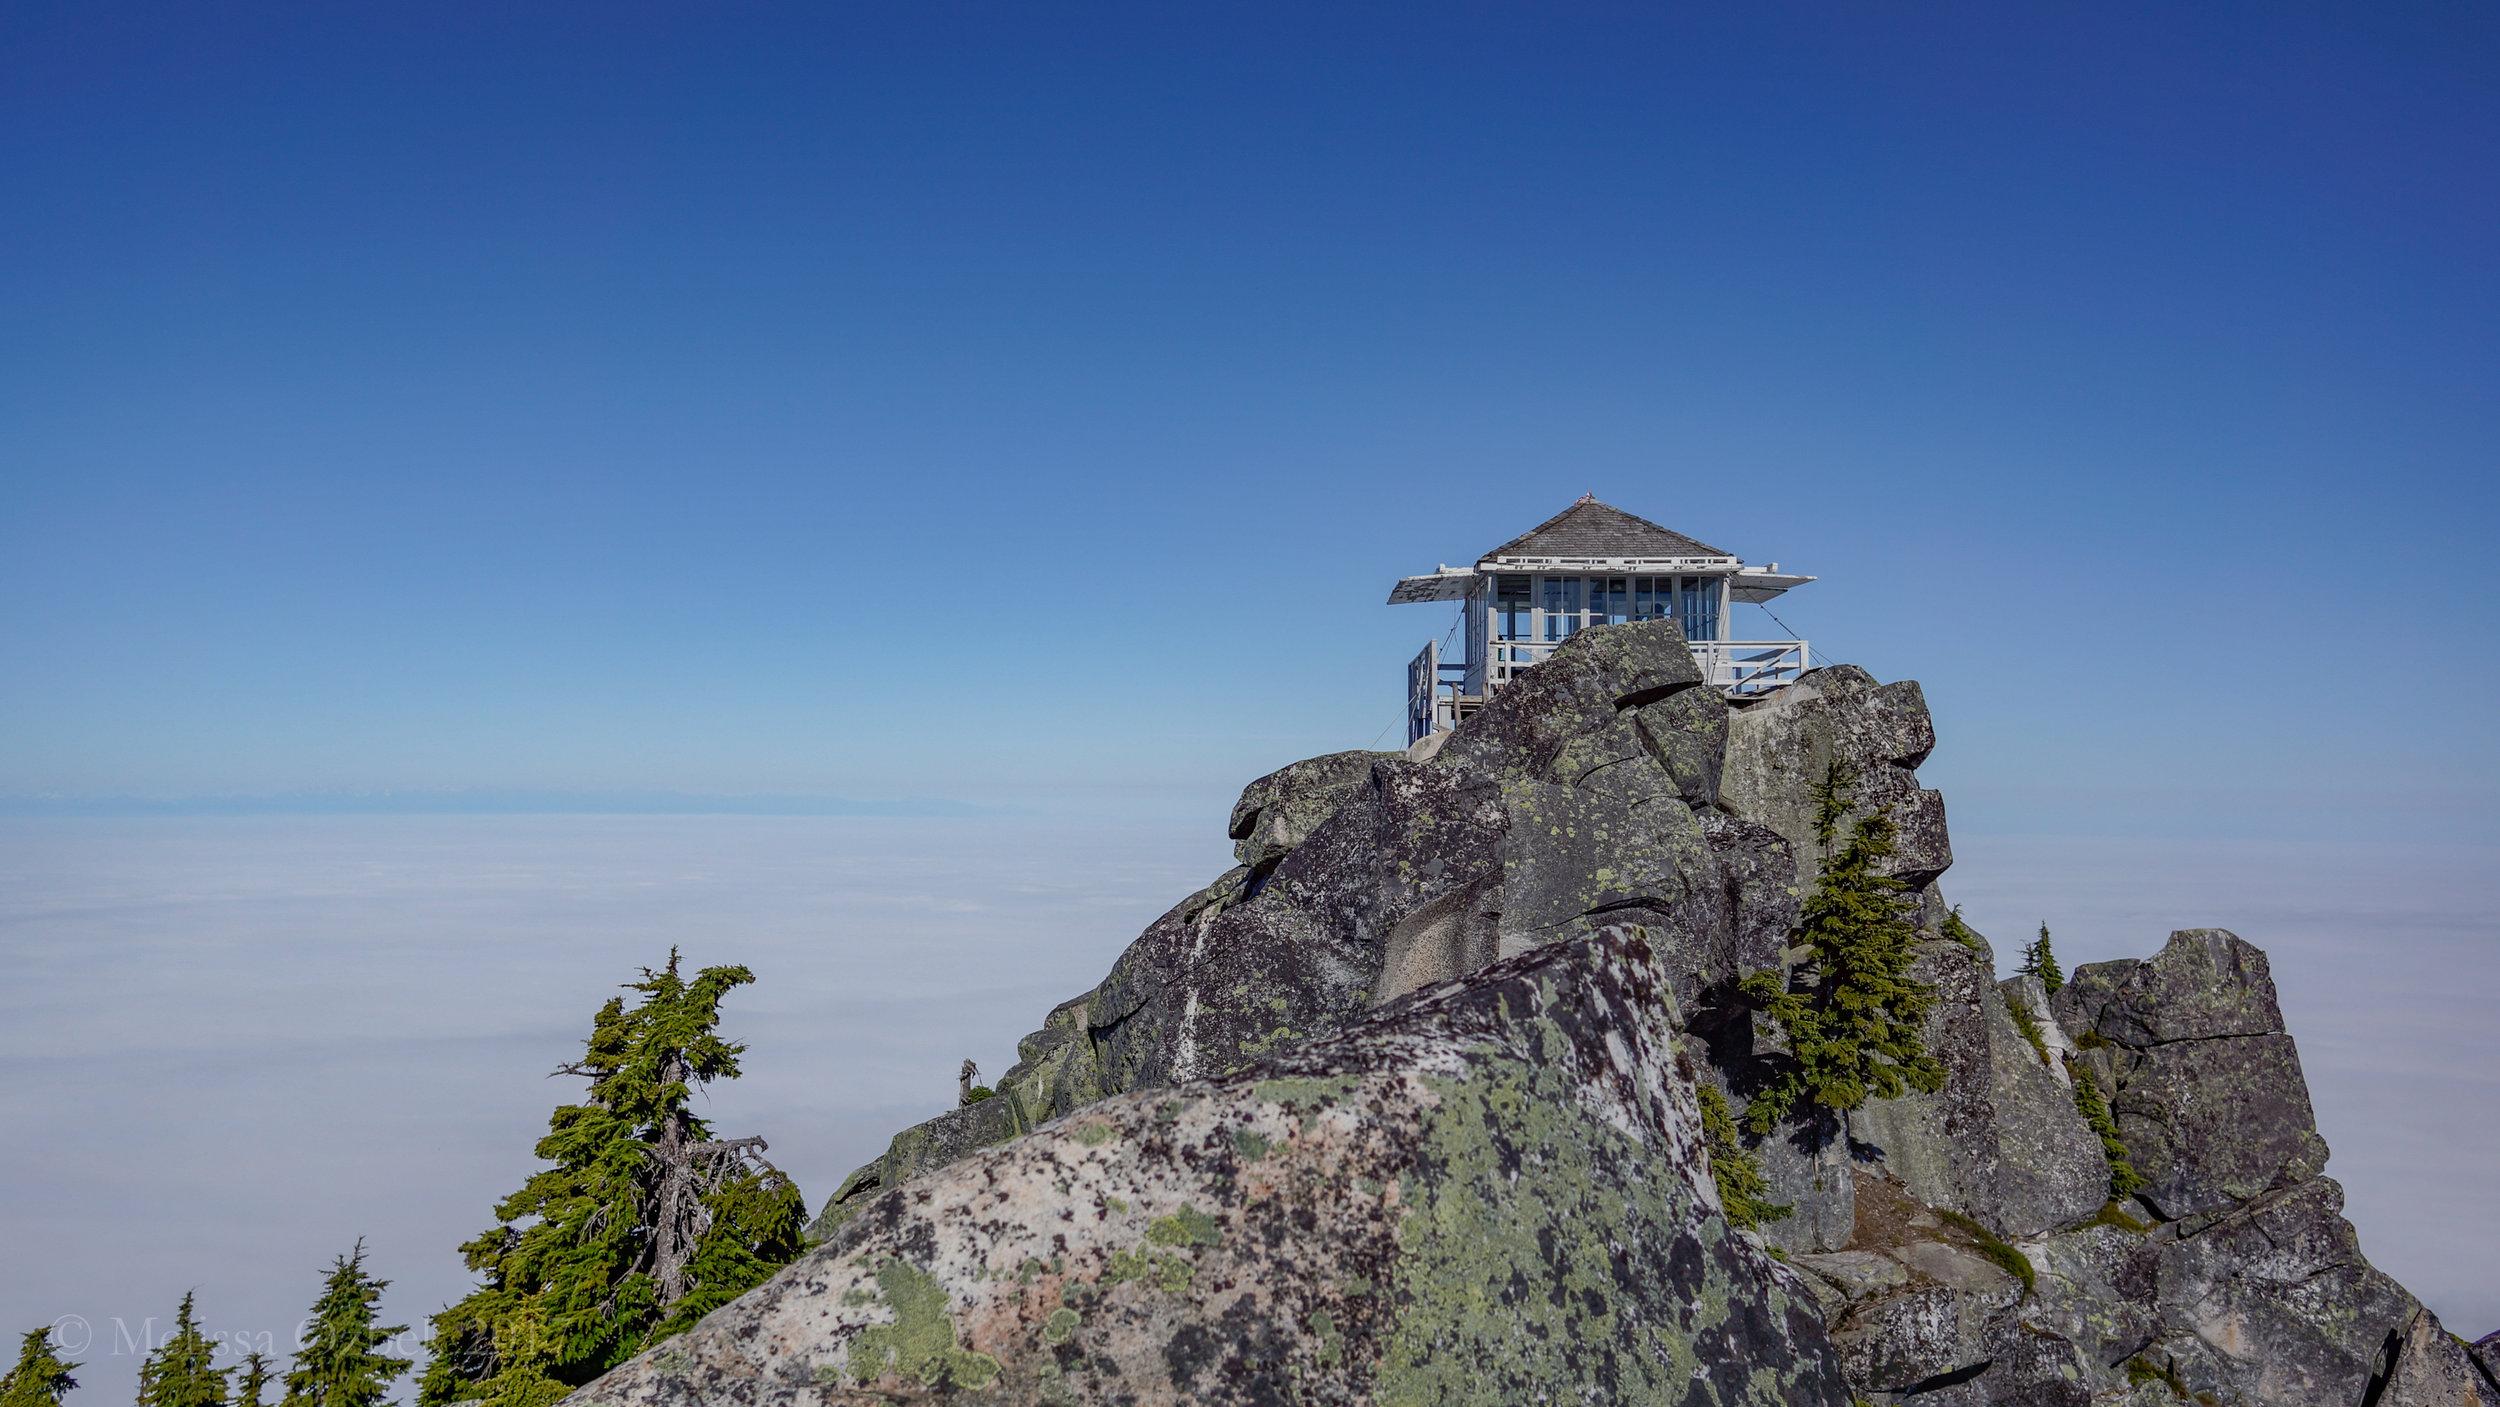 3. Mount Pilchuck